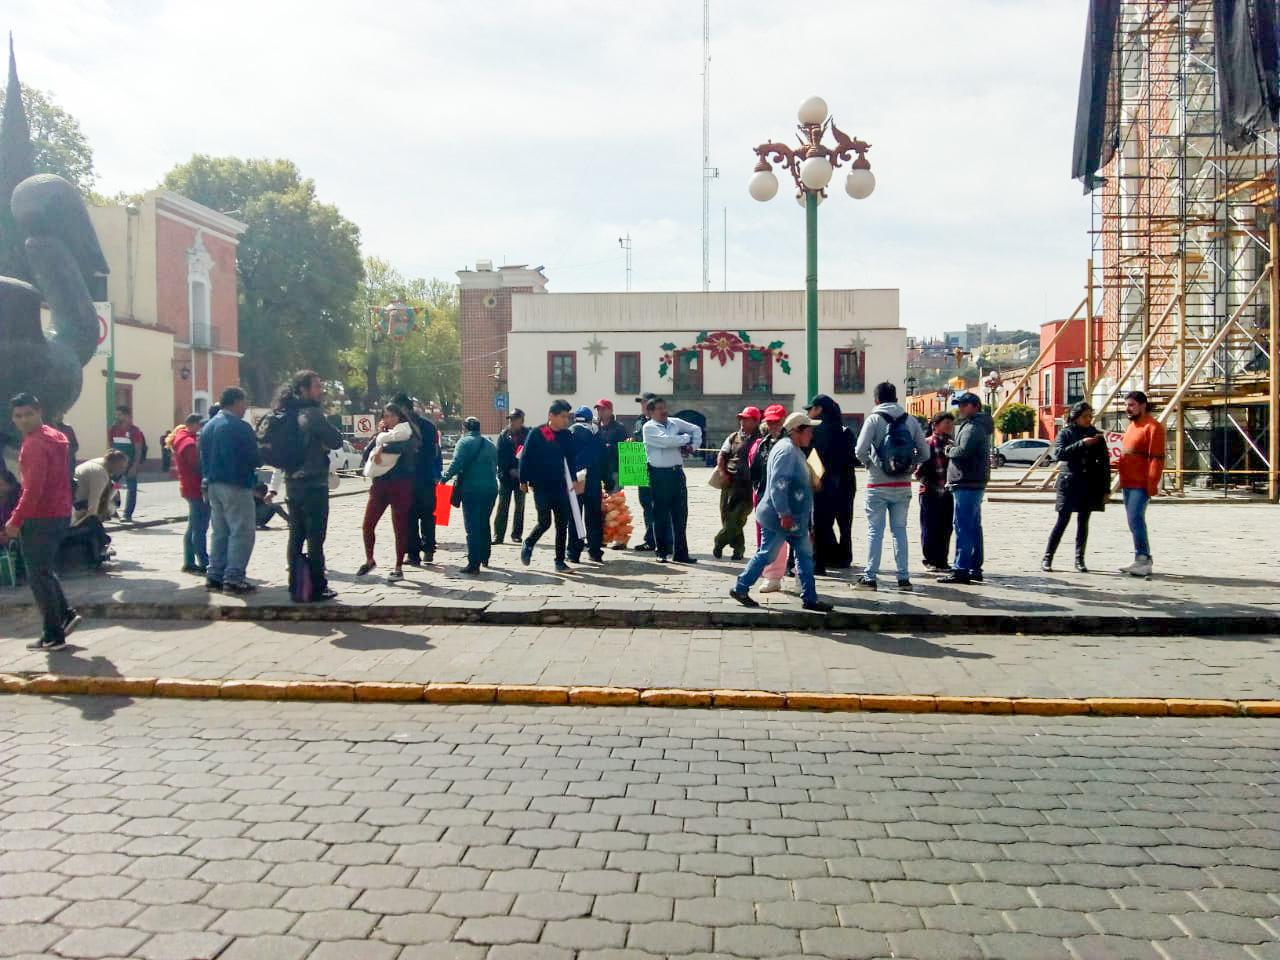 Feligreses de Zacatelco piden destitución de fiscal y párroco por intereses políticos